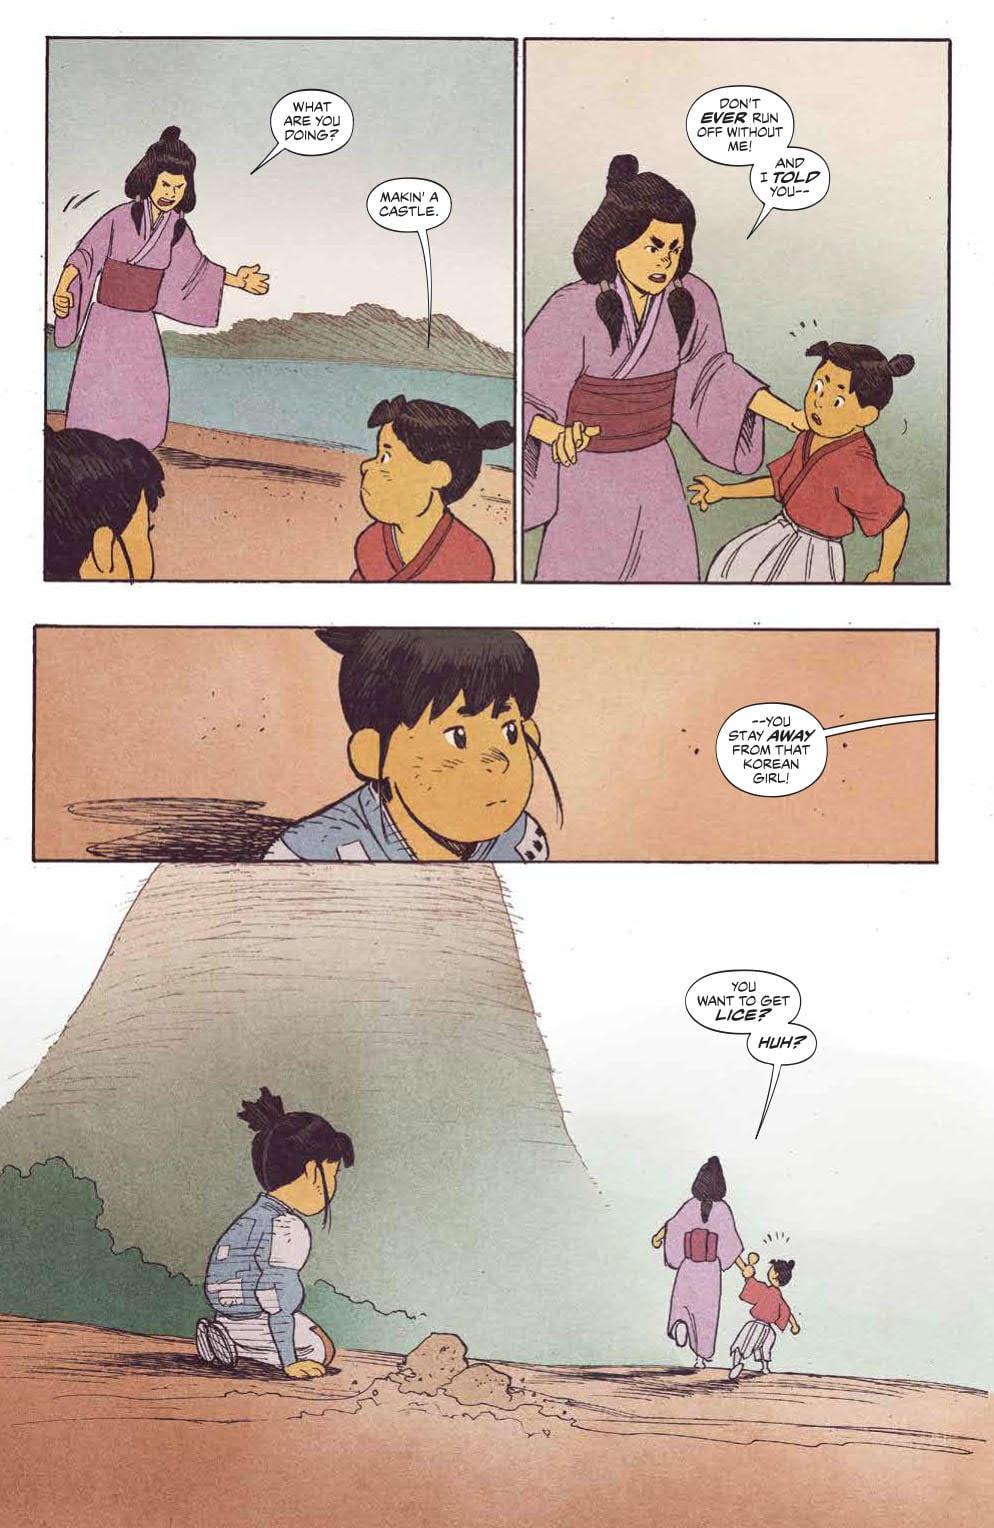 Kenichi's mother taking him away from Hana as children